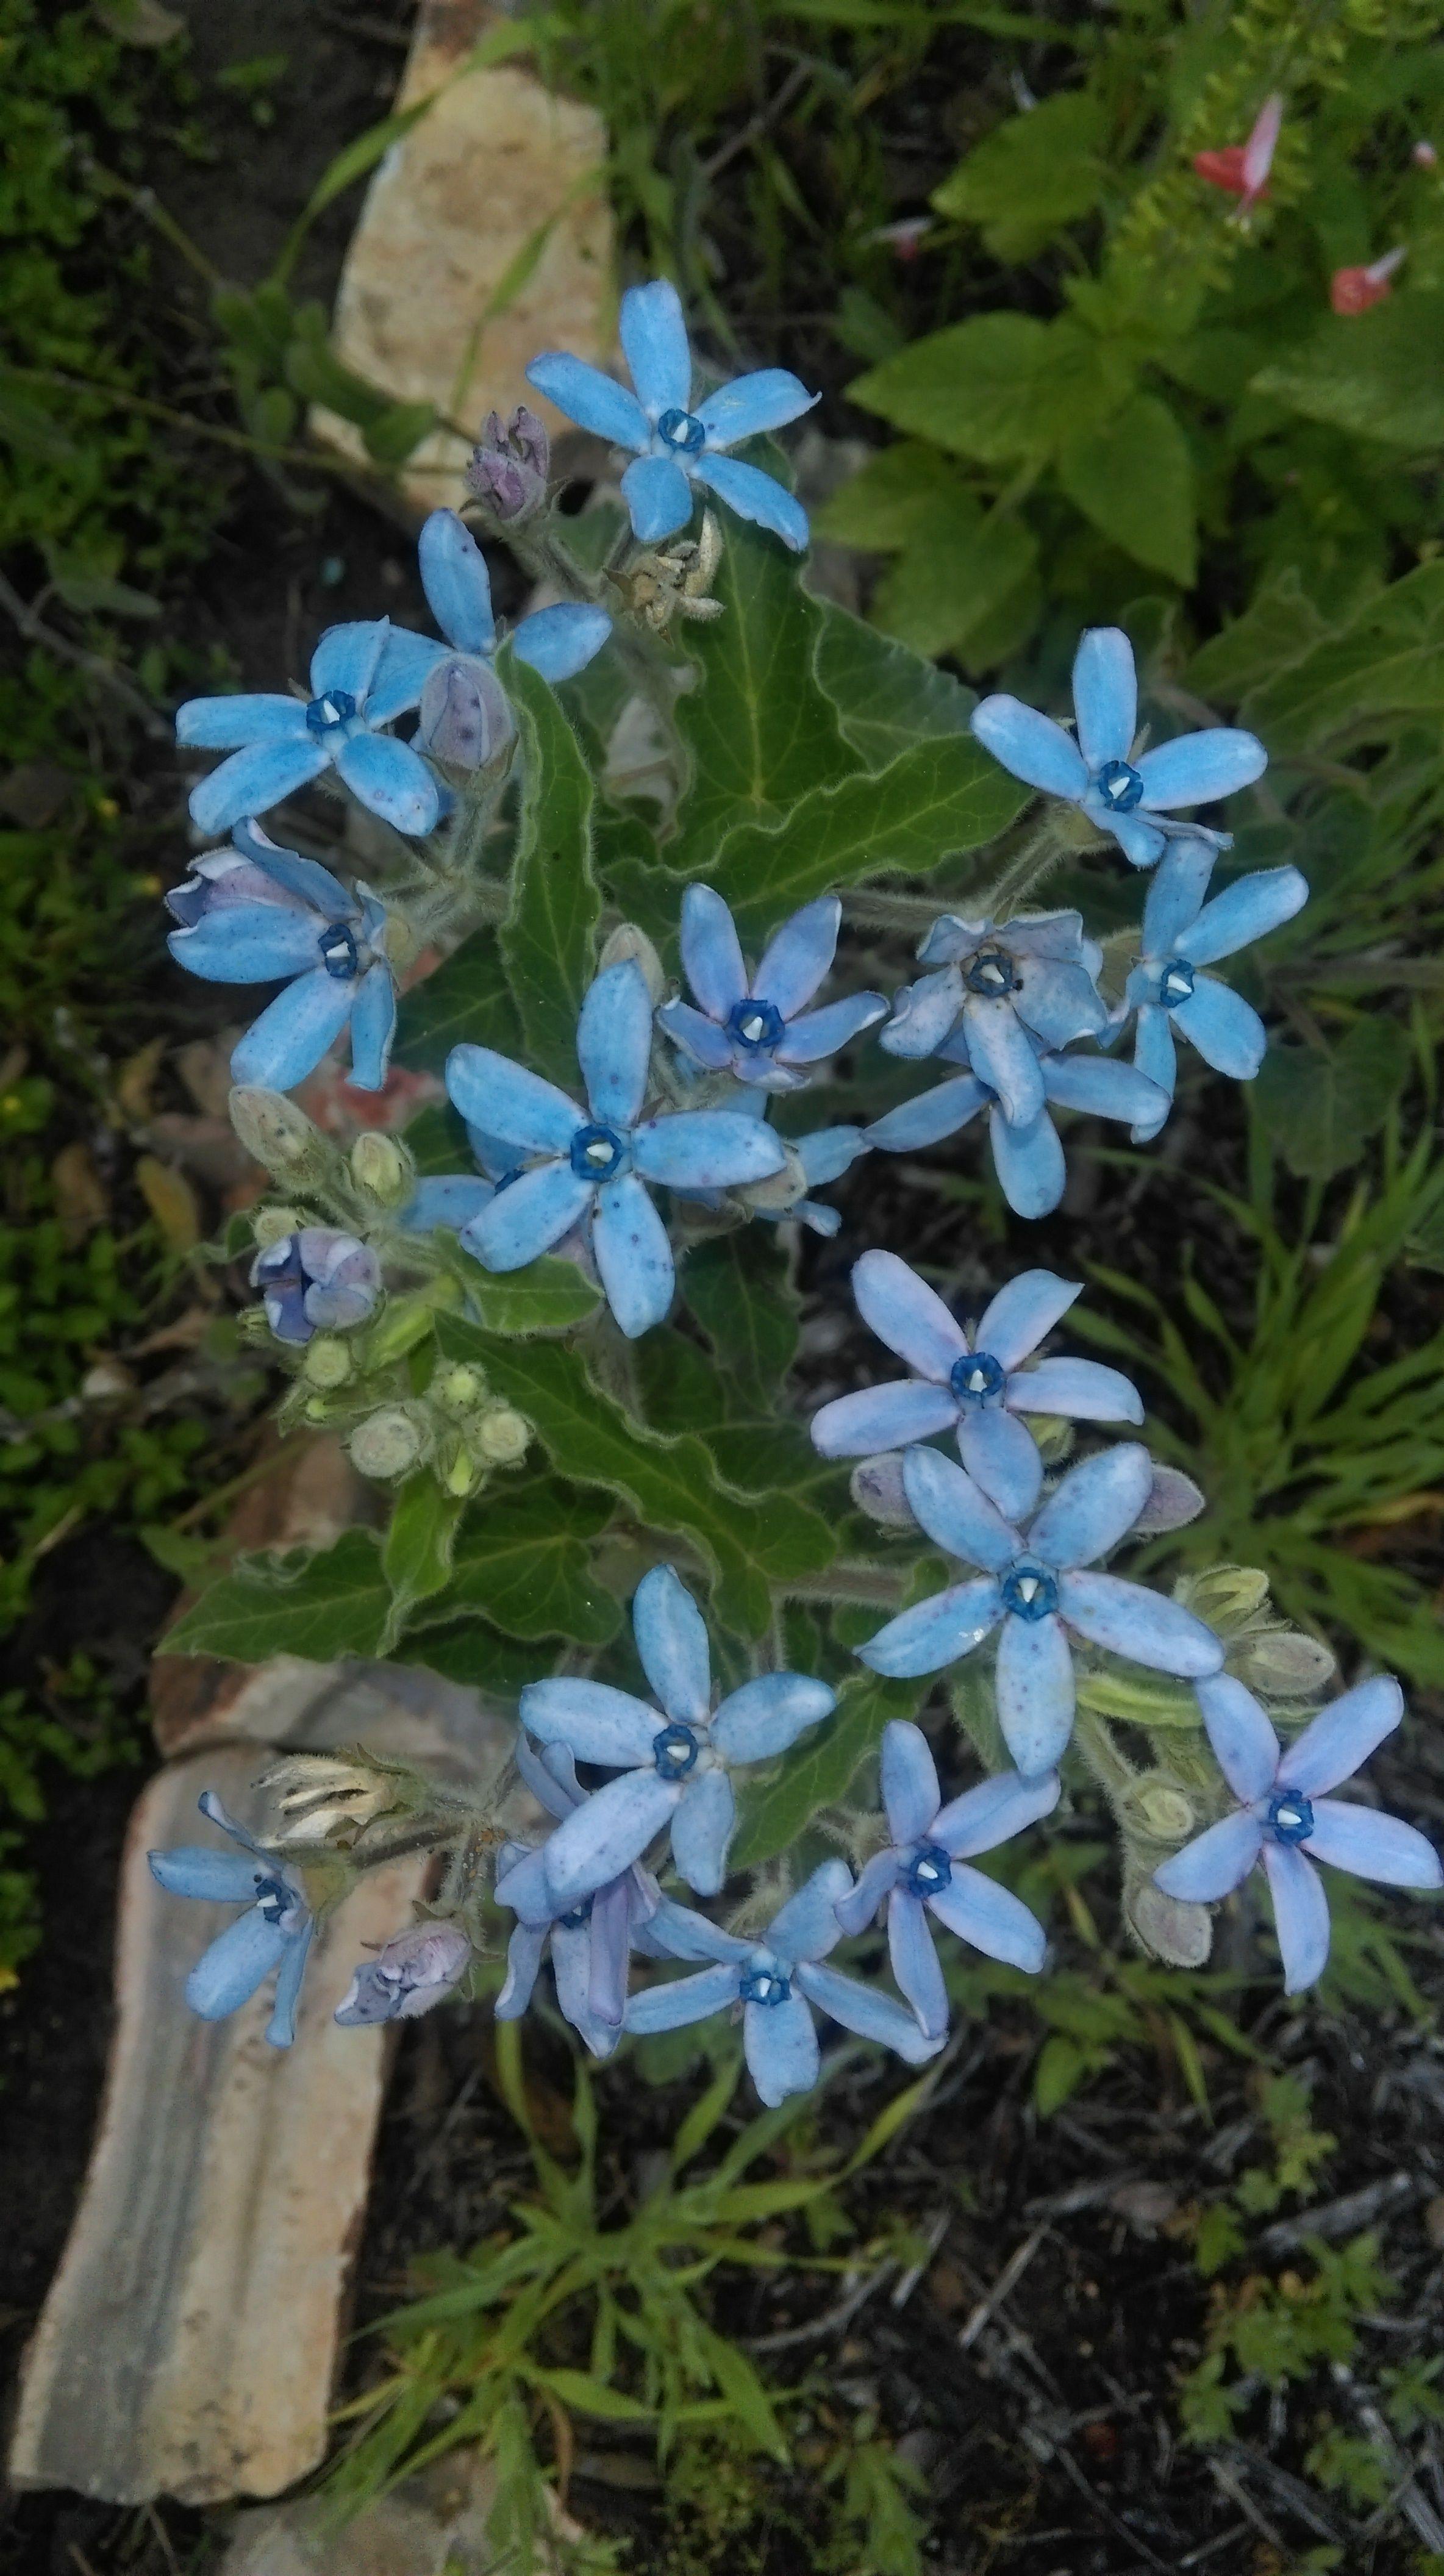 Oxypetalum Caeruleum Blue Milkweed Plants In The Yard